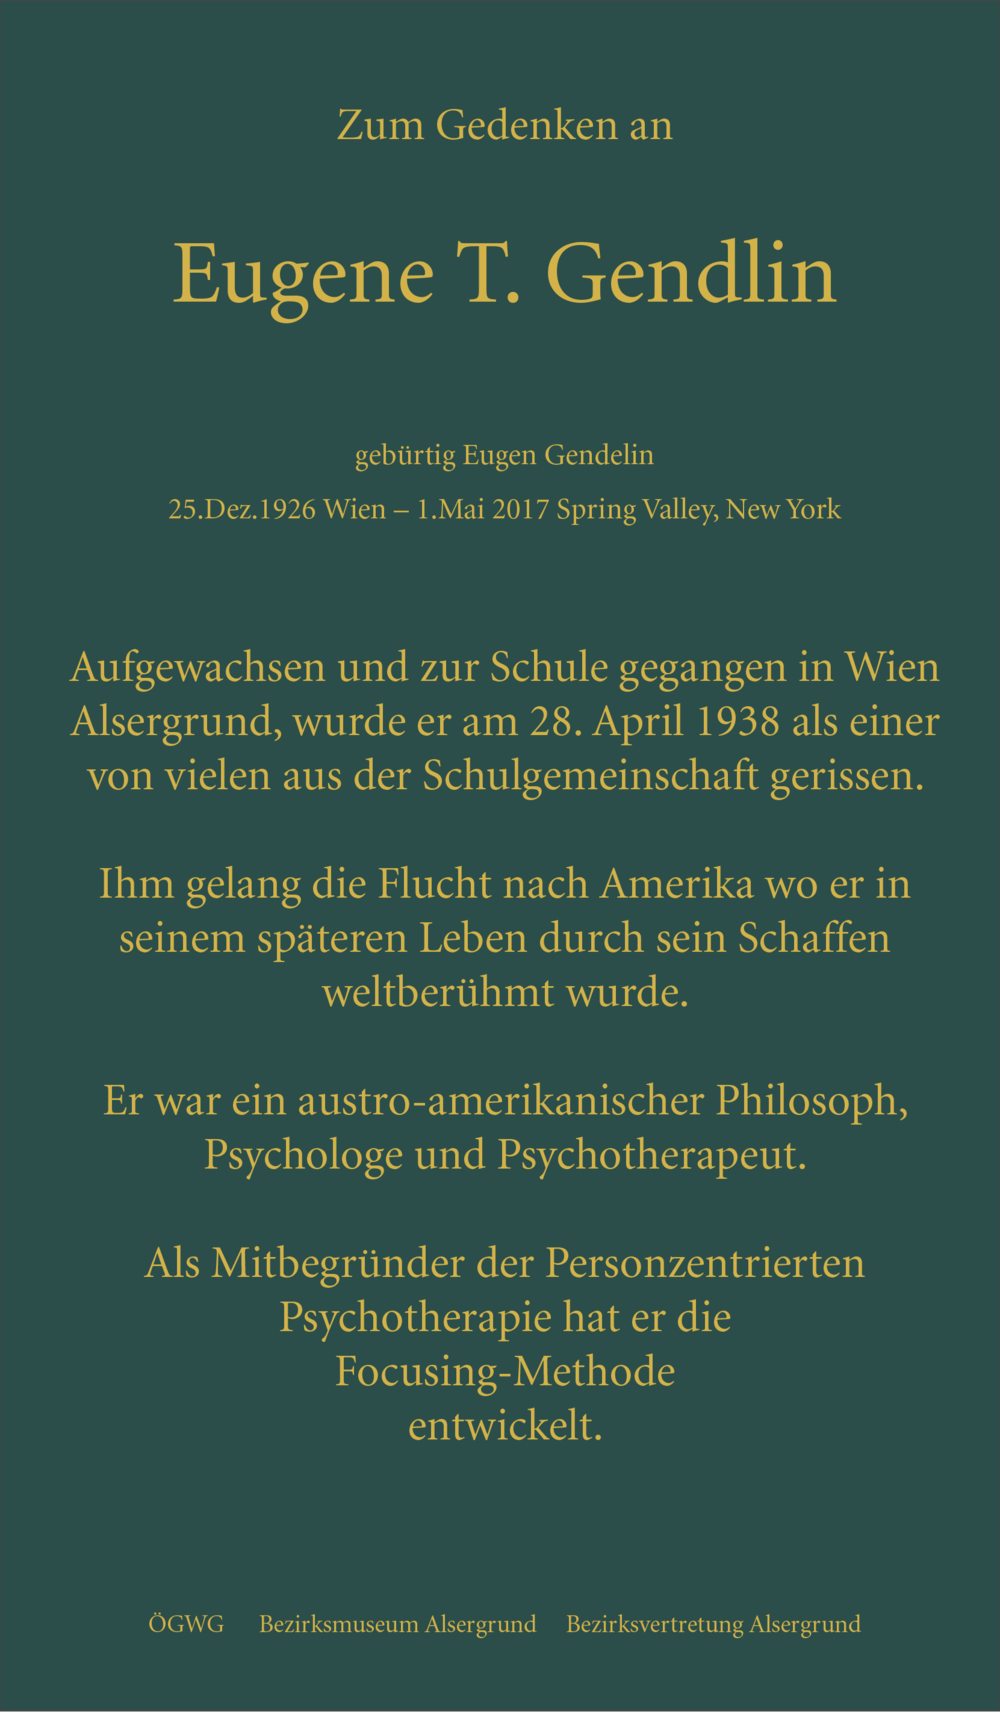 2018-05-02-Vienna-plaque.png